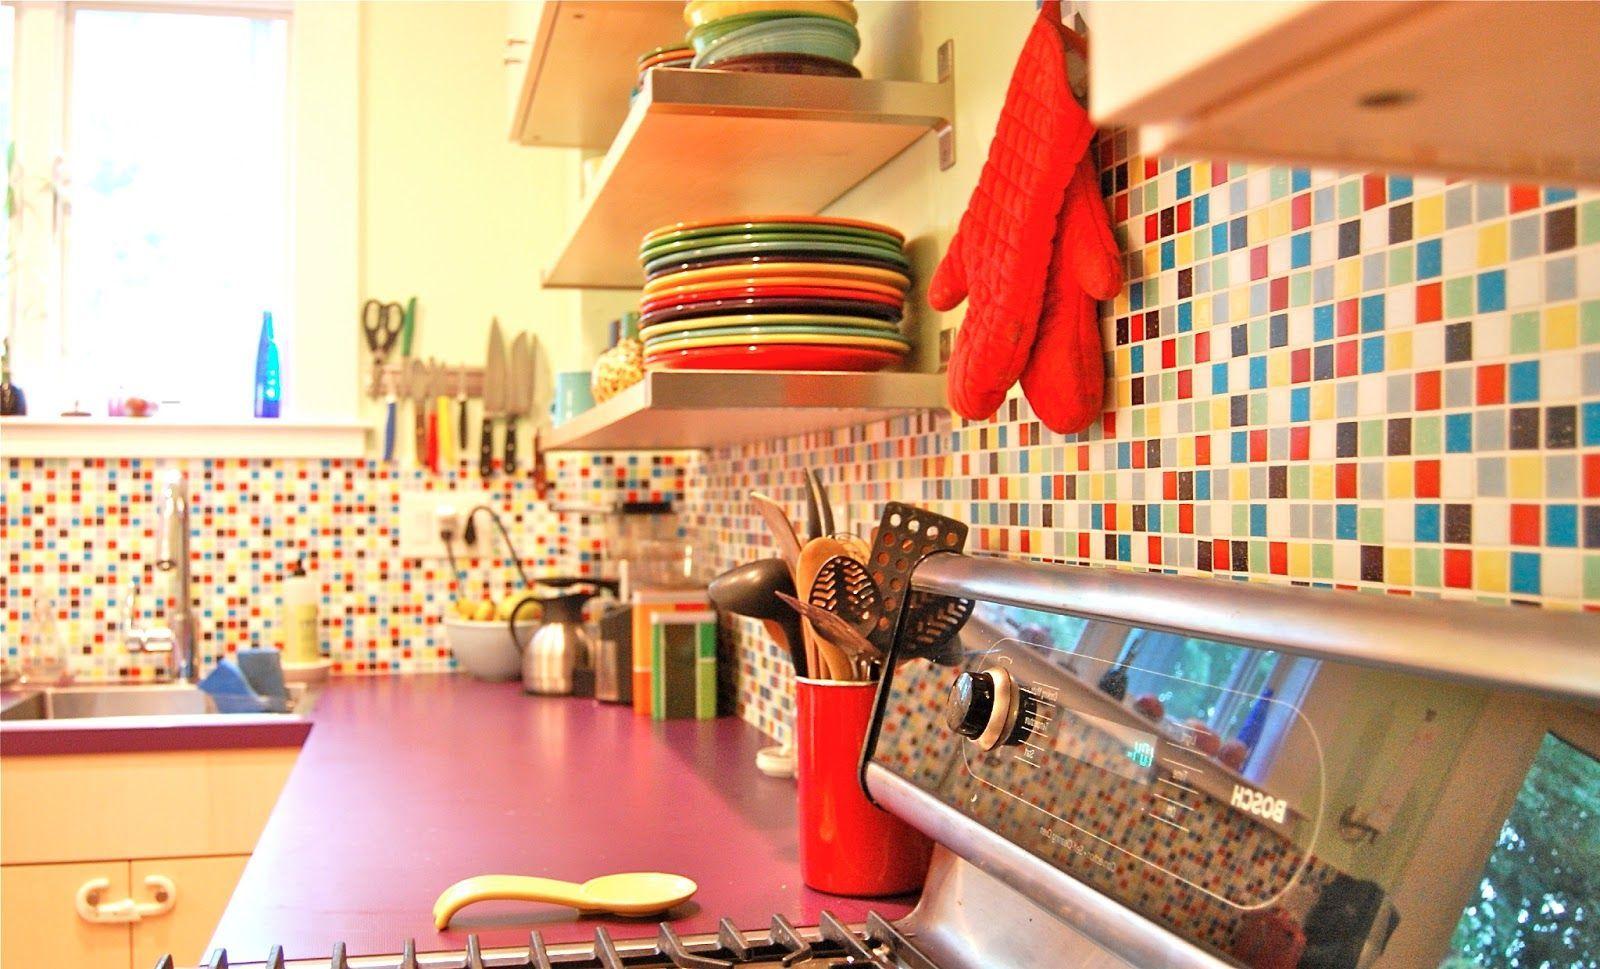 Uncategorized Colorful Kitchen Backsplash kitchen colorful ideas playing with backsplashes colors for kitchen